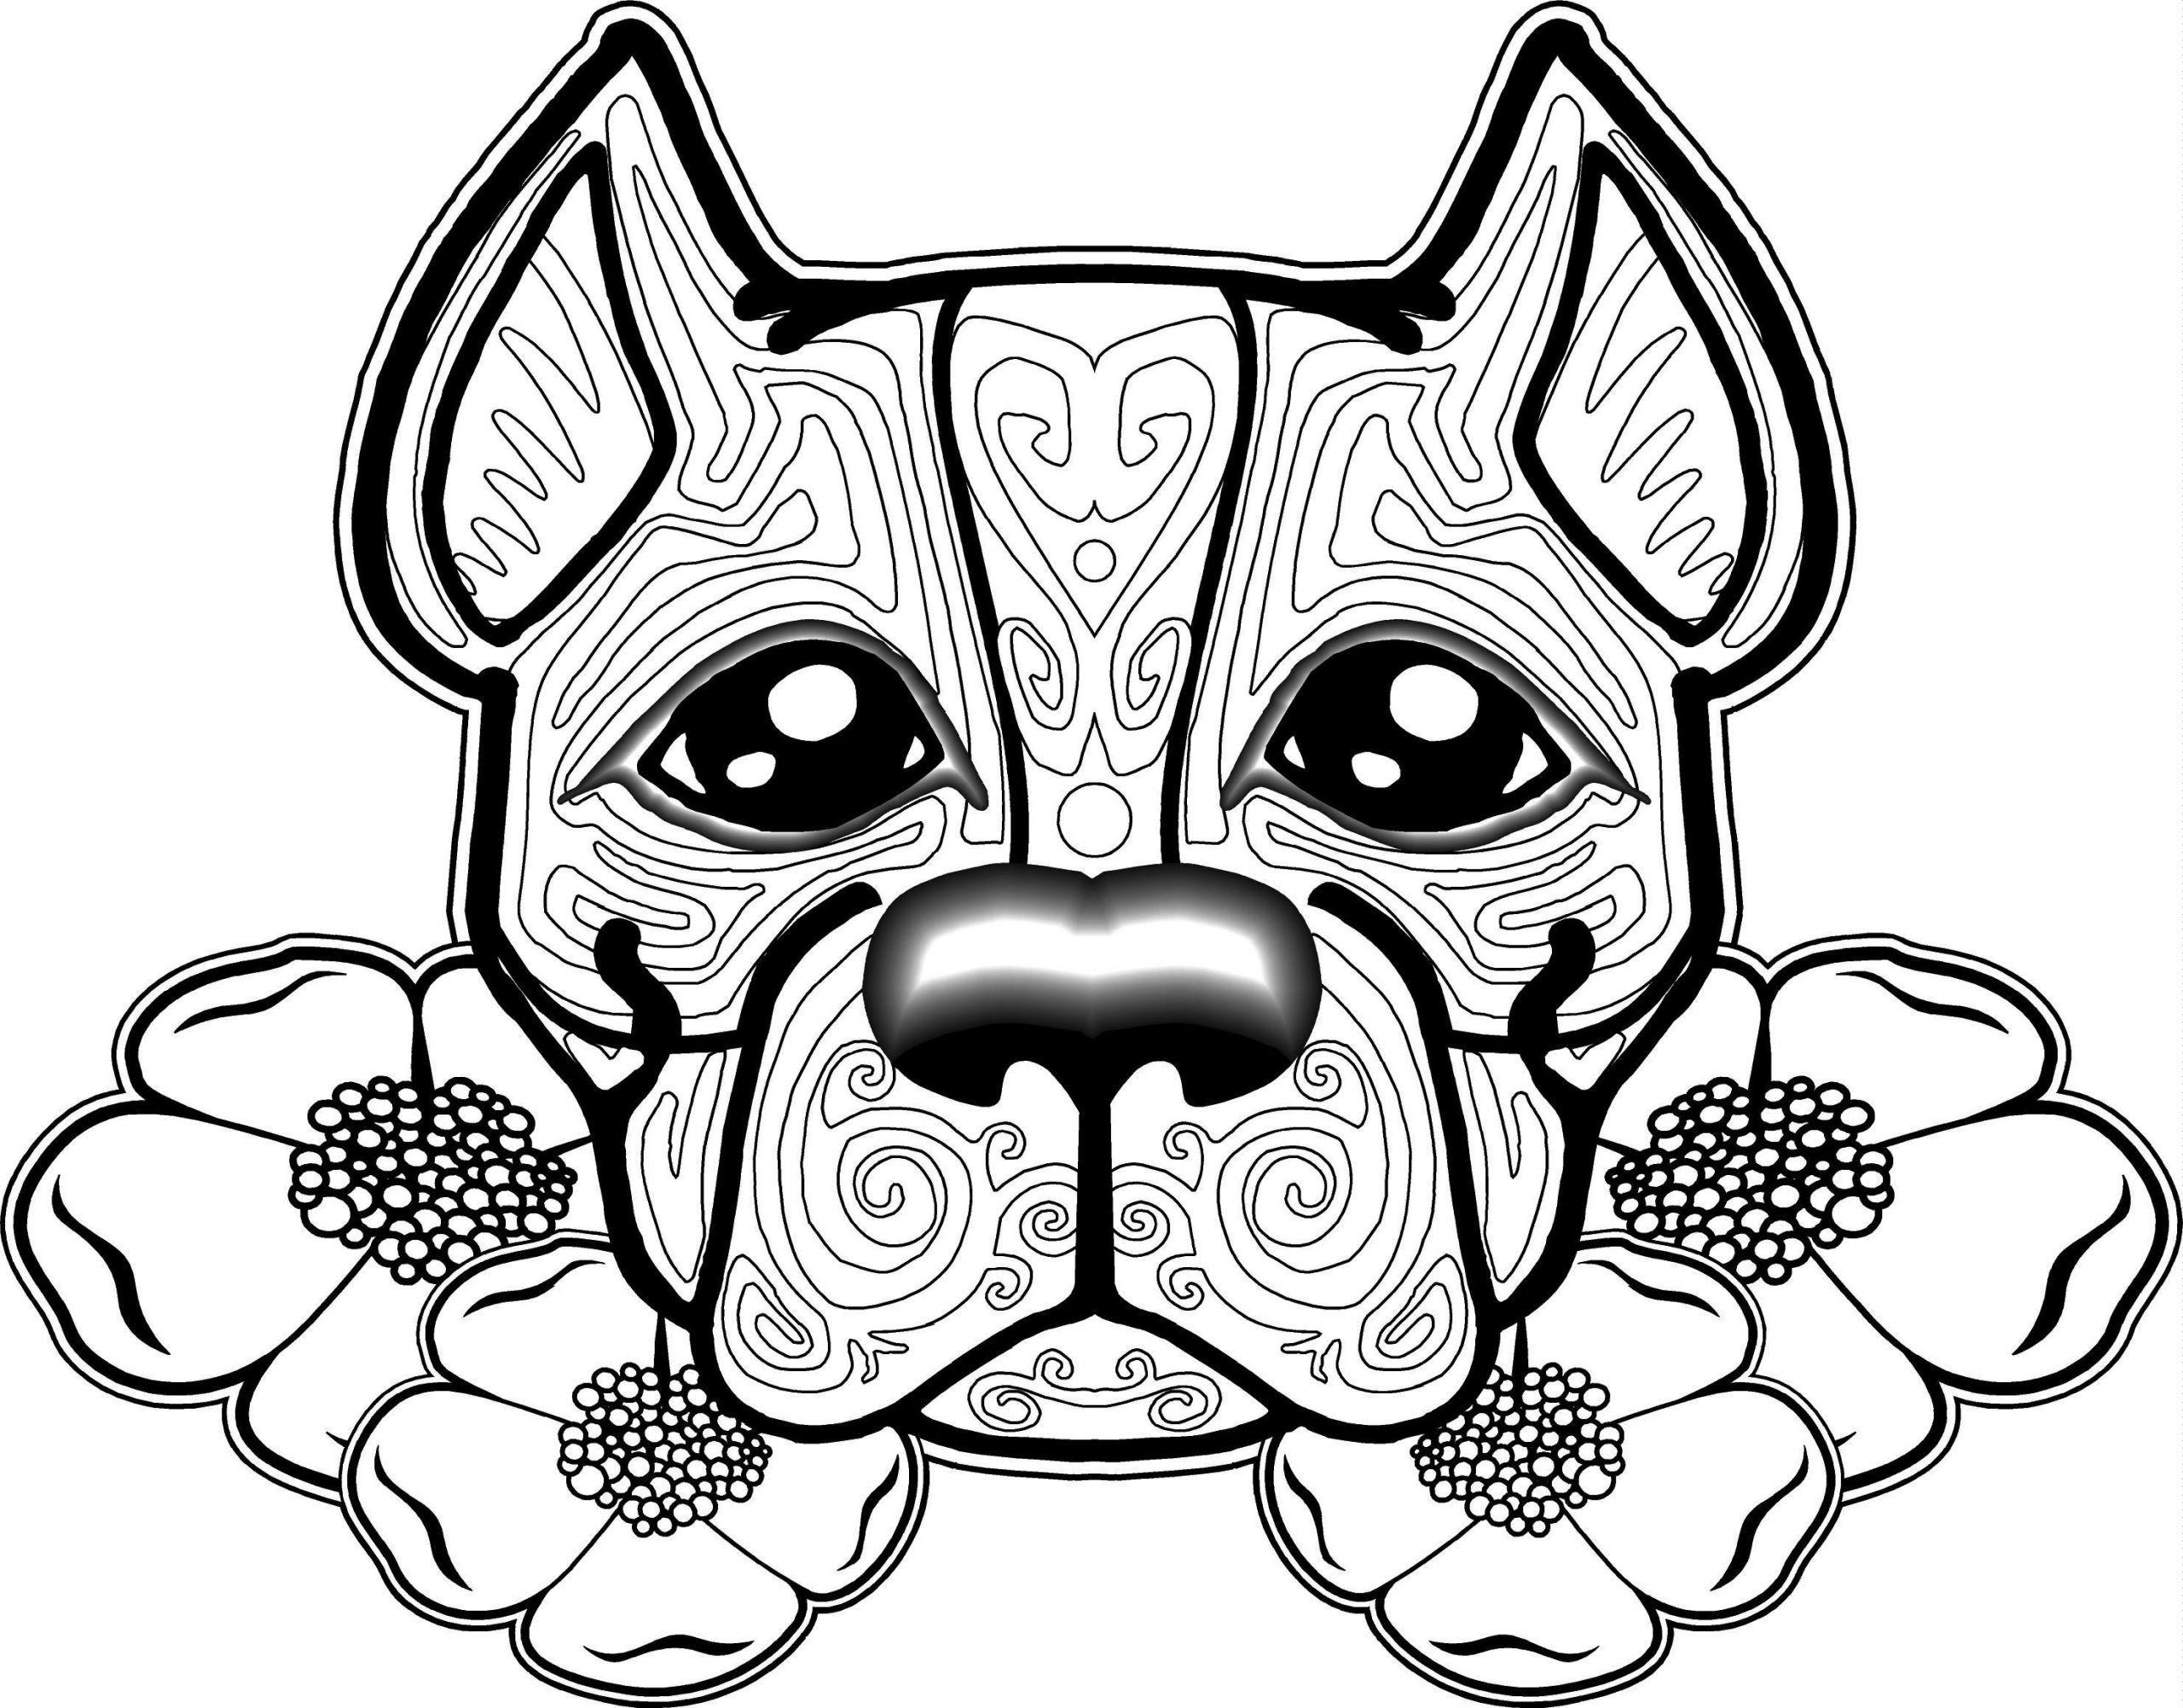 5 Worksheet Dog Coloring Pages For Kids Free Printable Dog